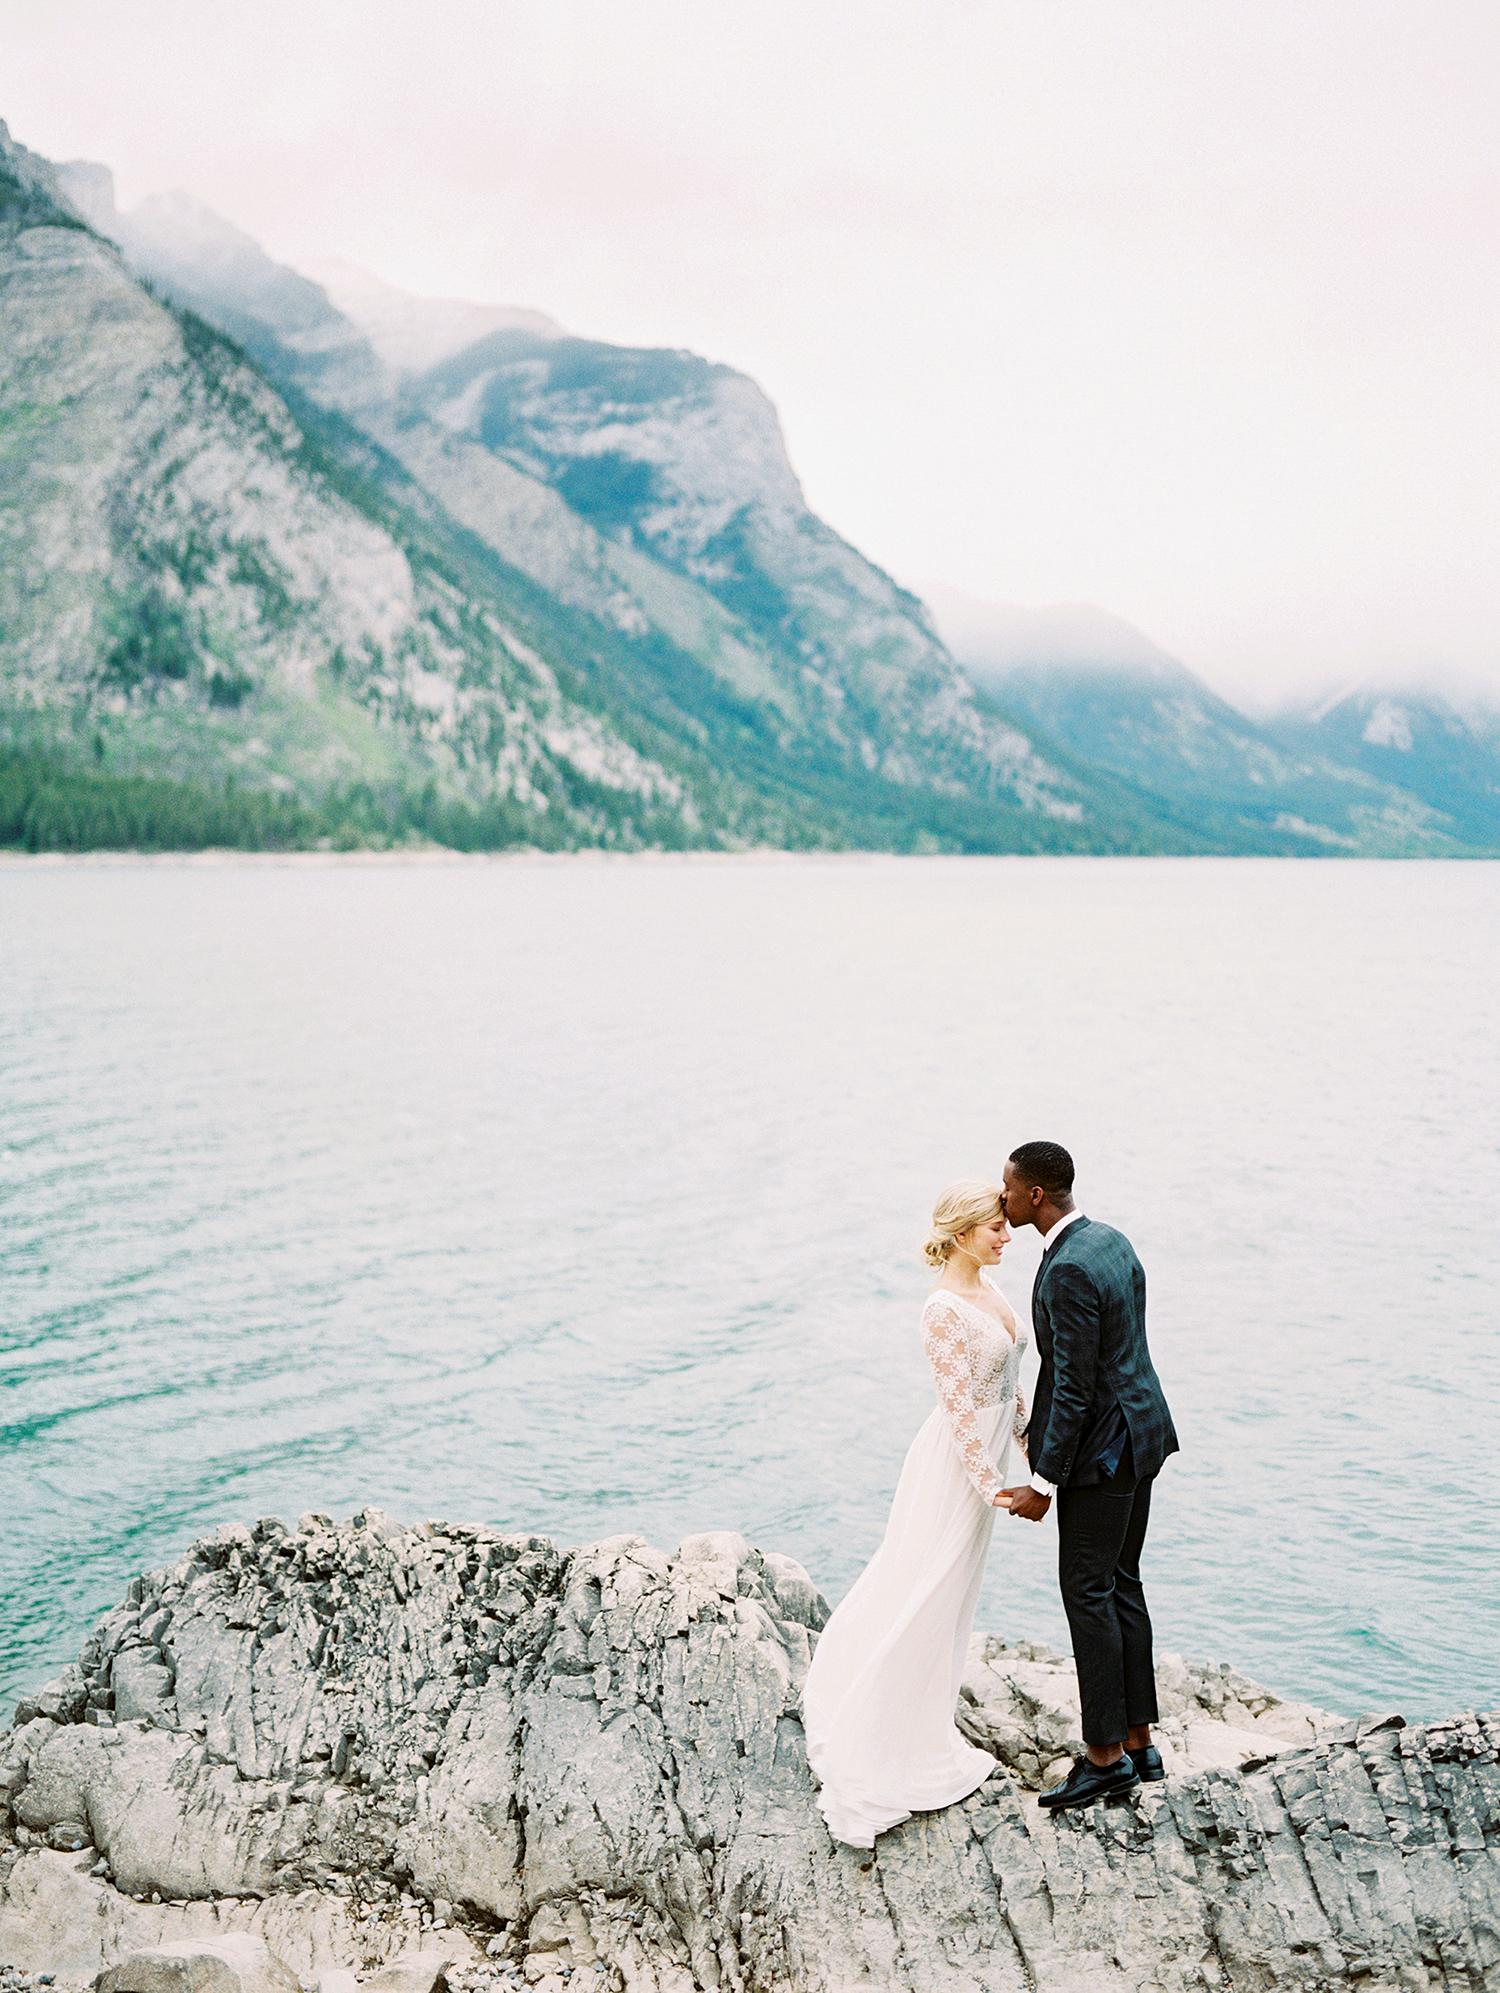 couple standing on rock overlooking water